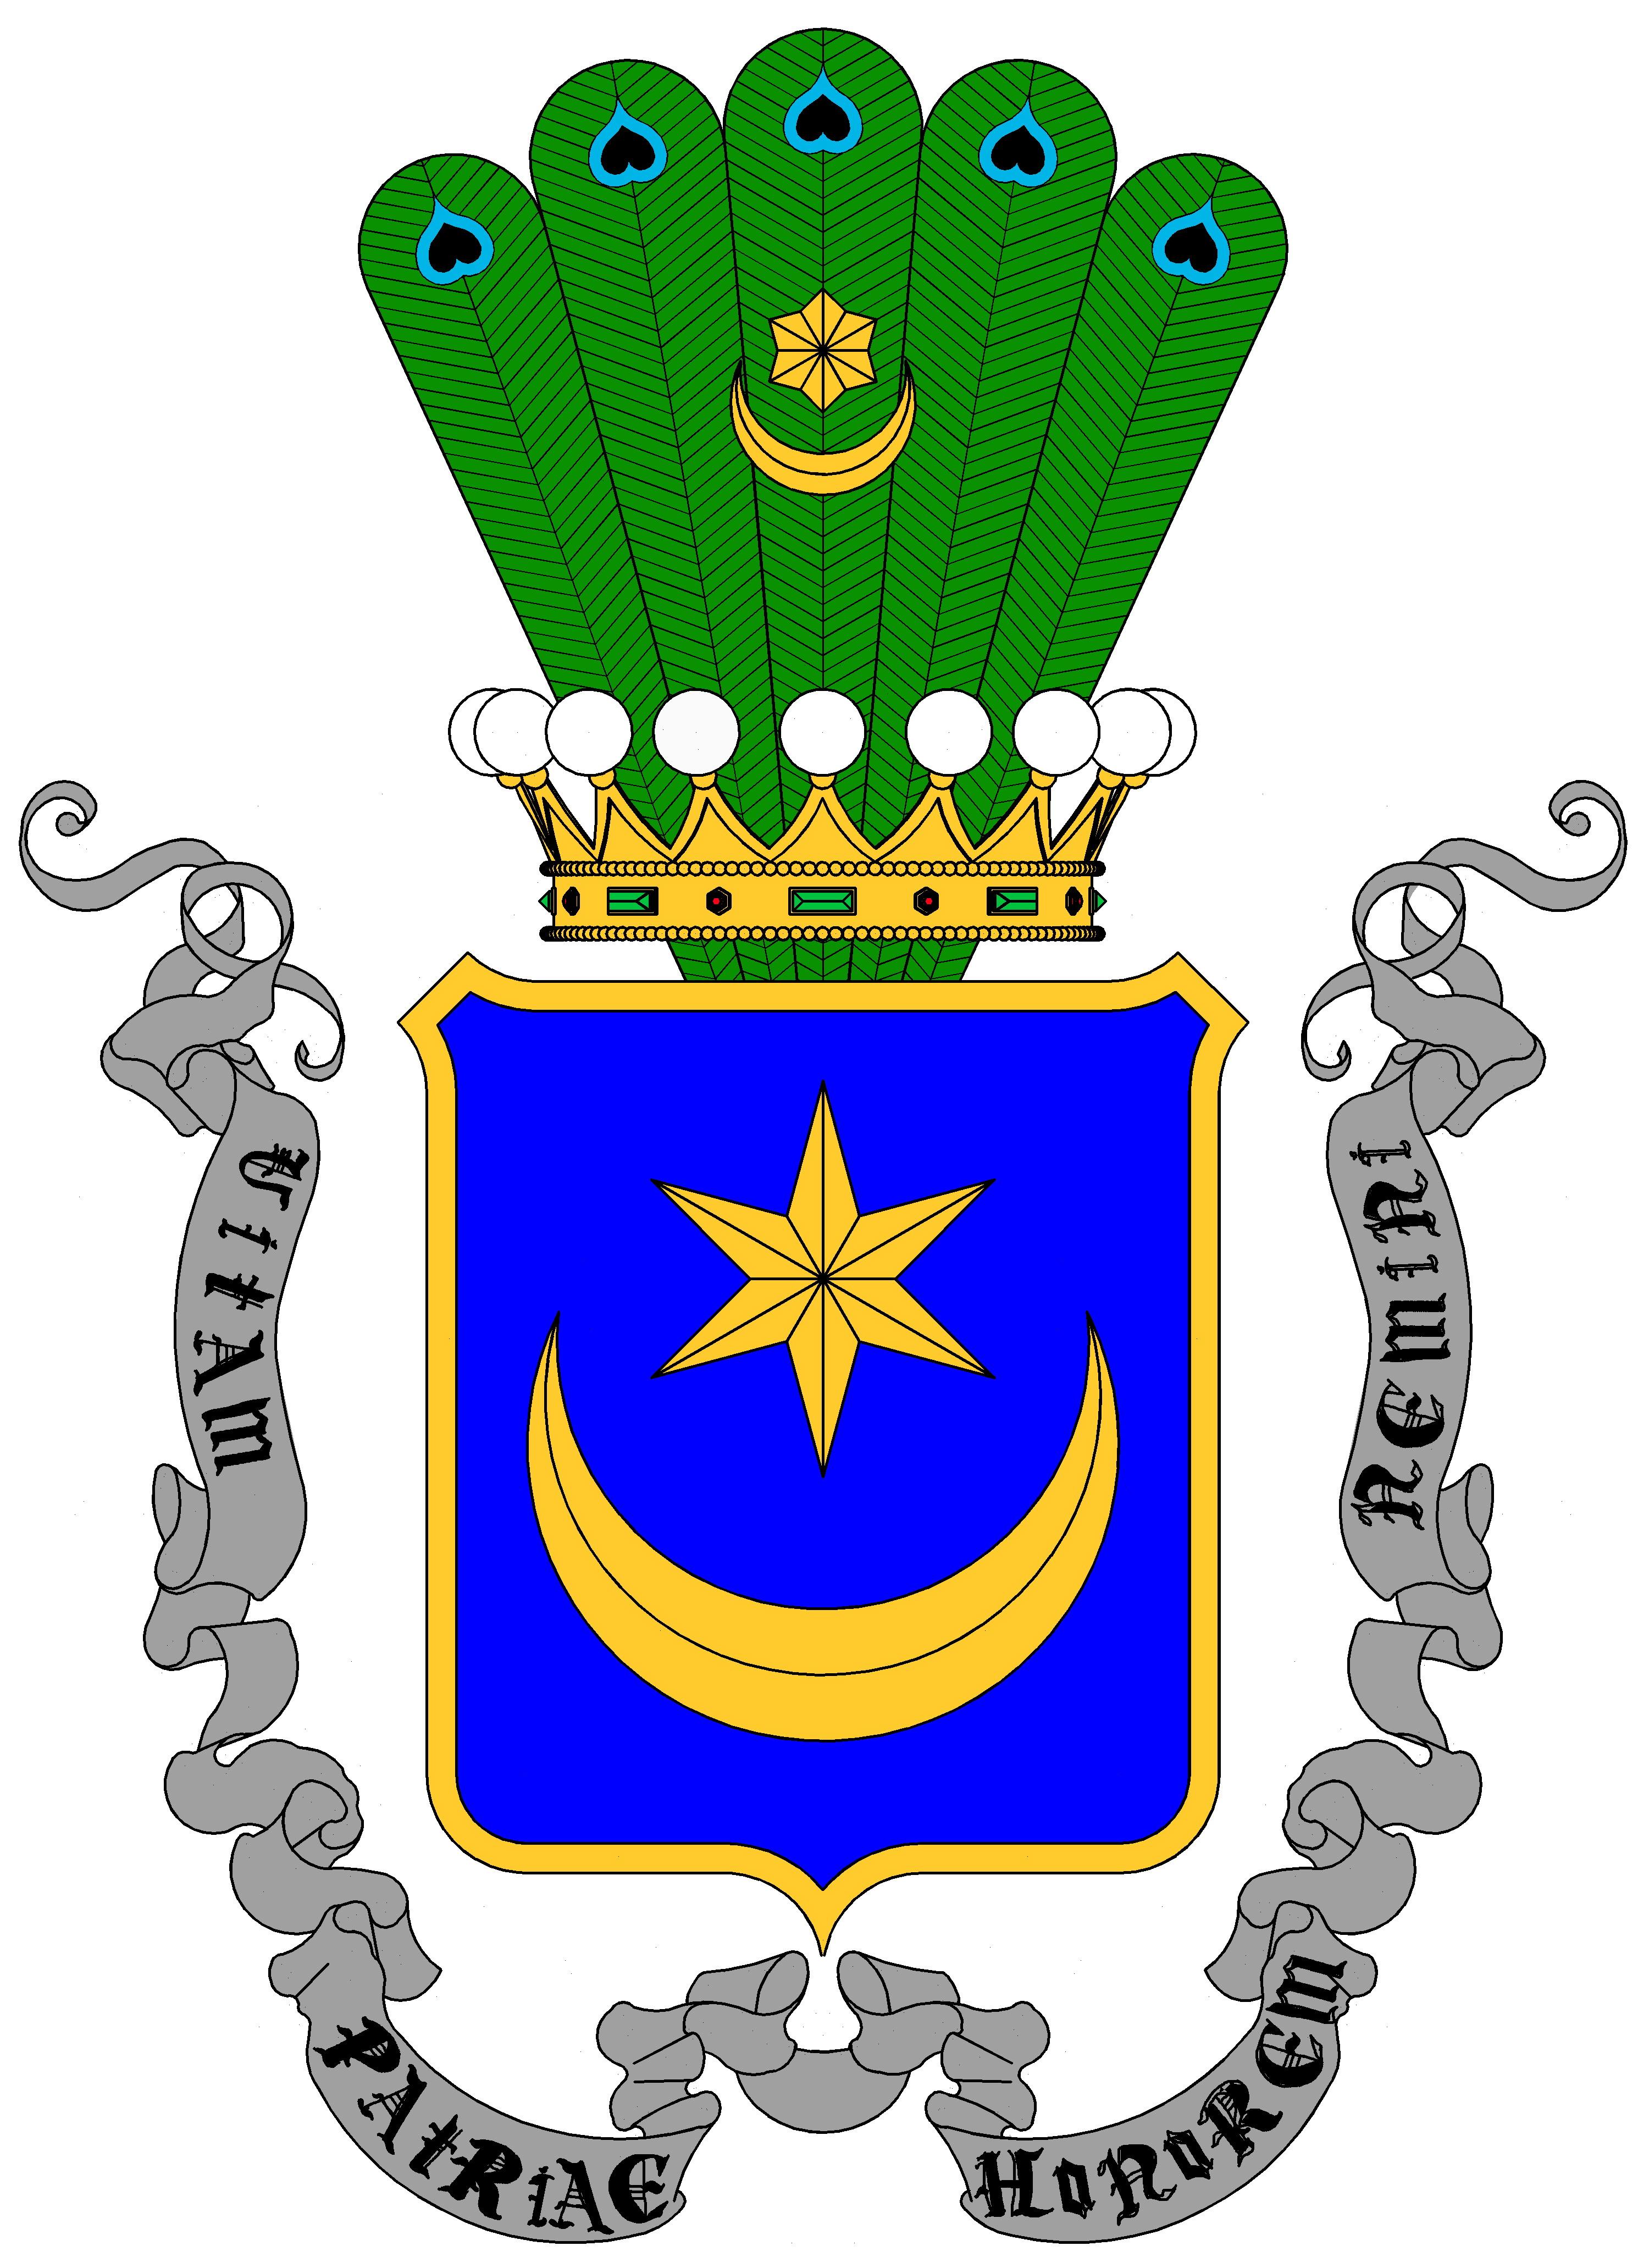 Vitam patriae, honorem nemini («Жизнь — Отчизне, честь — никому»)